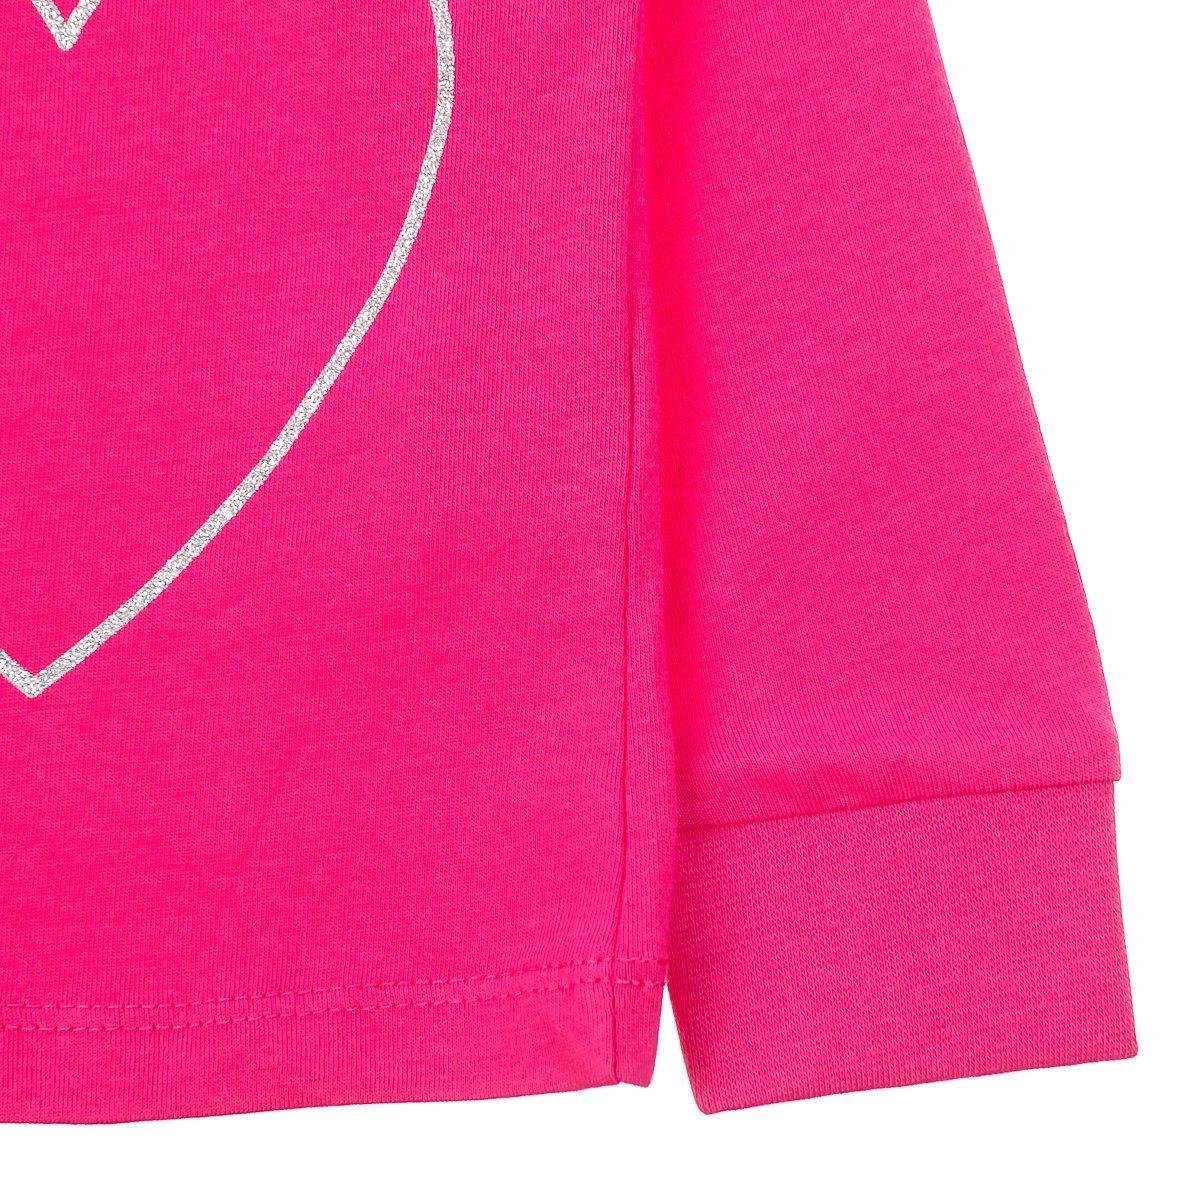 Нижнее белье, пижамы, халаты, Пижама BluKids Love to the Moon and back, р. 104 5264548 ТМ: BluKids, белый с розовым  - купить со скидкой